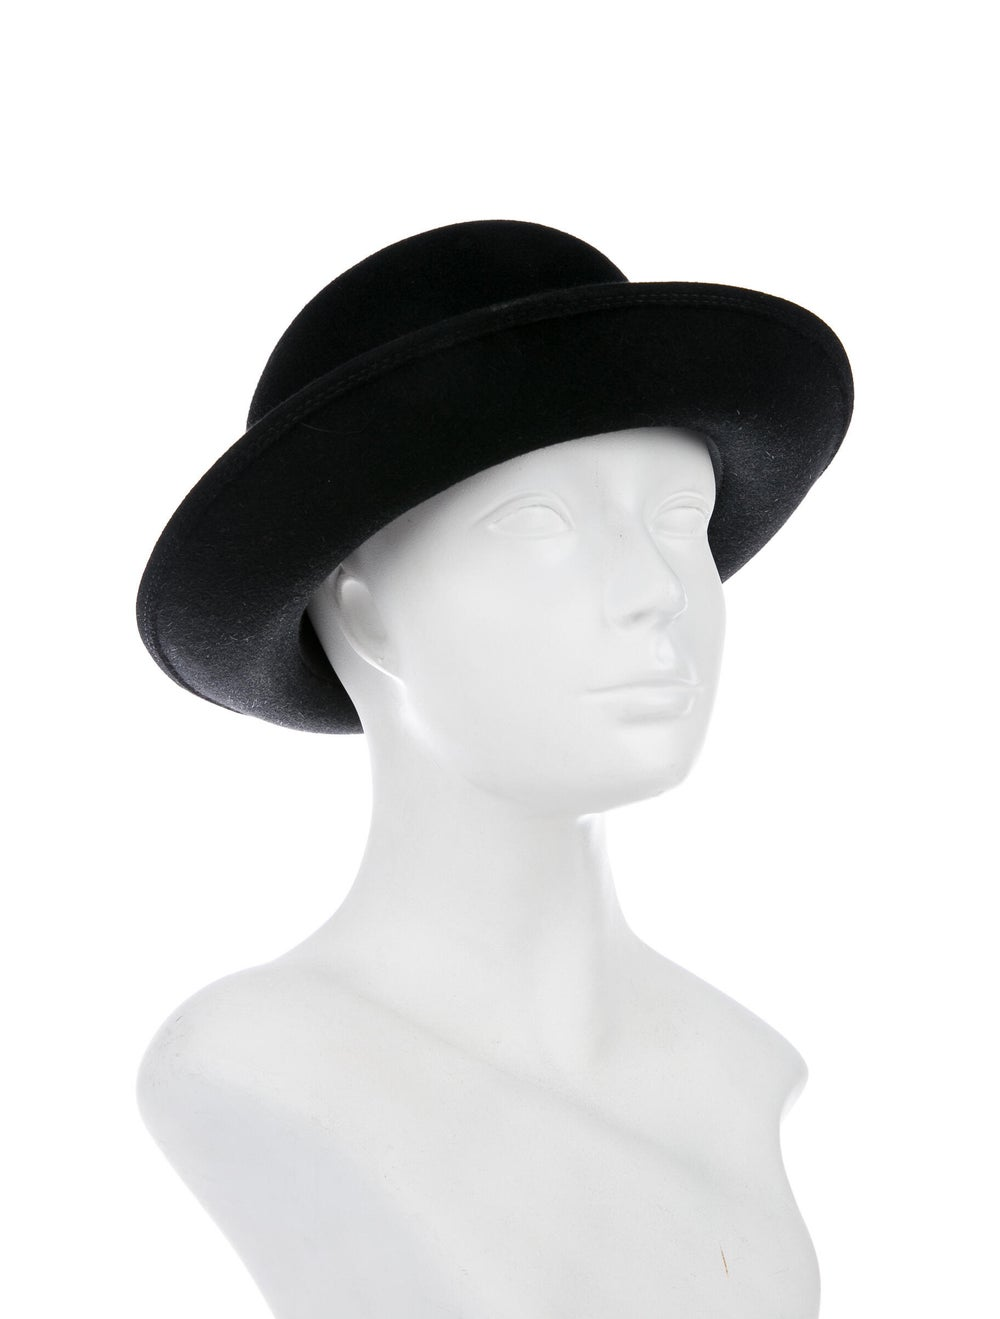 Patricia Underwood Felt Bowler Hat Black - image 3